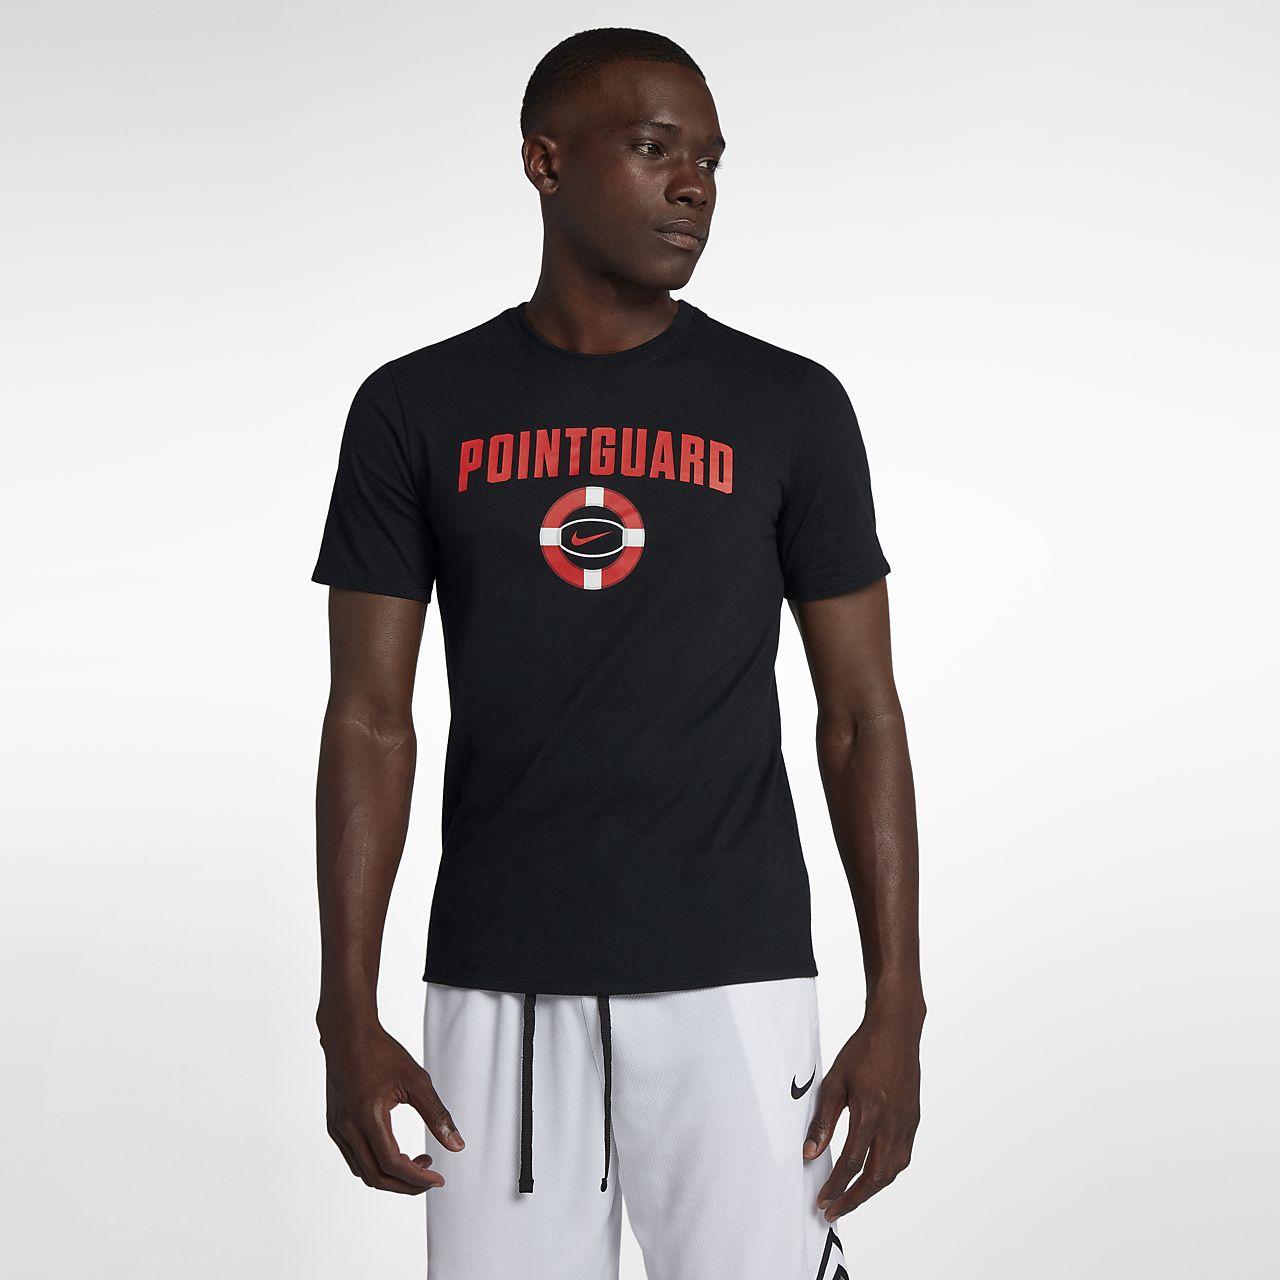 4c06eb16 Nike Dri Fit Basketball Legend T Shirt - DREAMWORKS